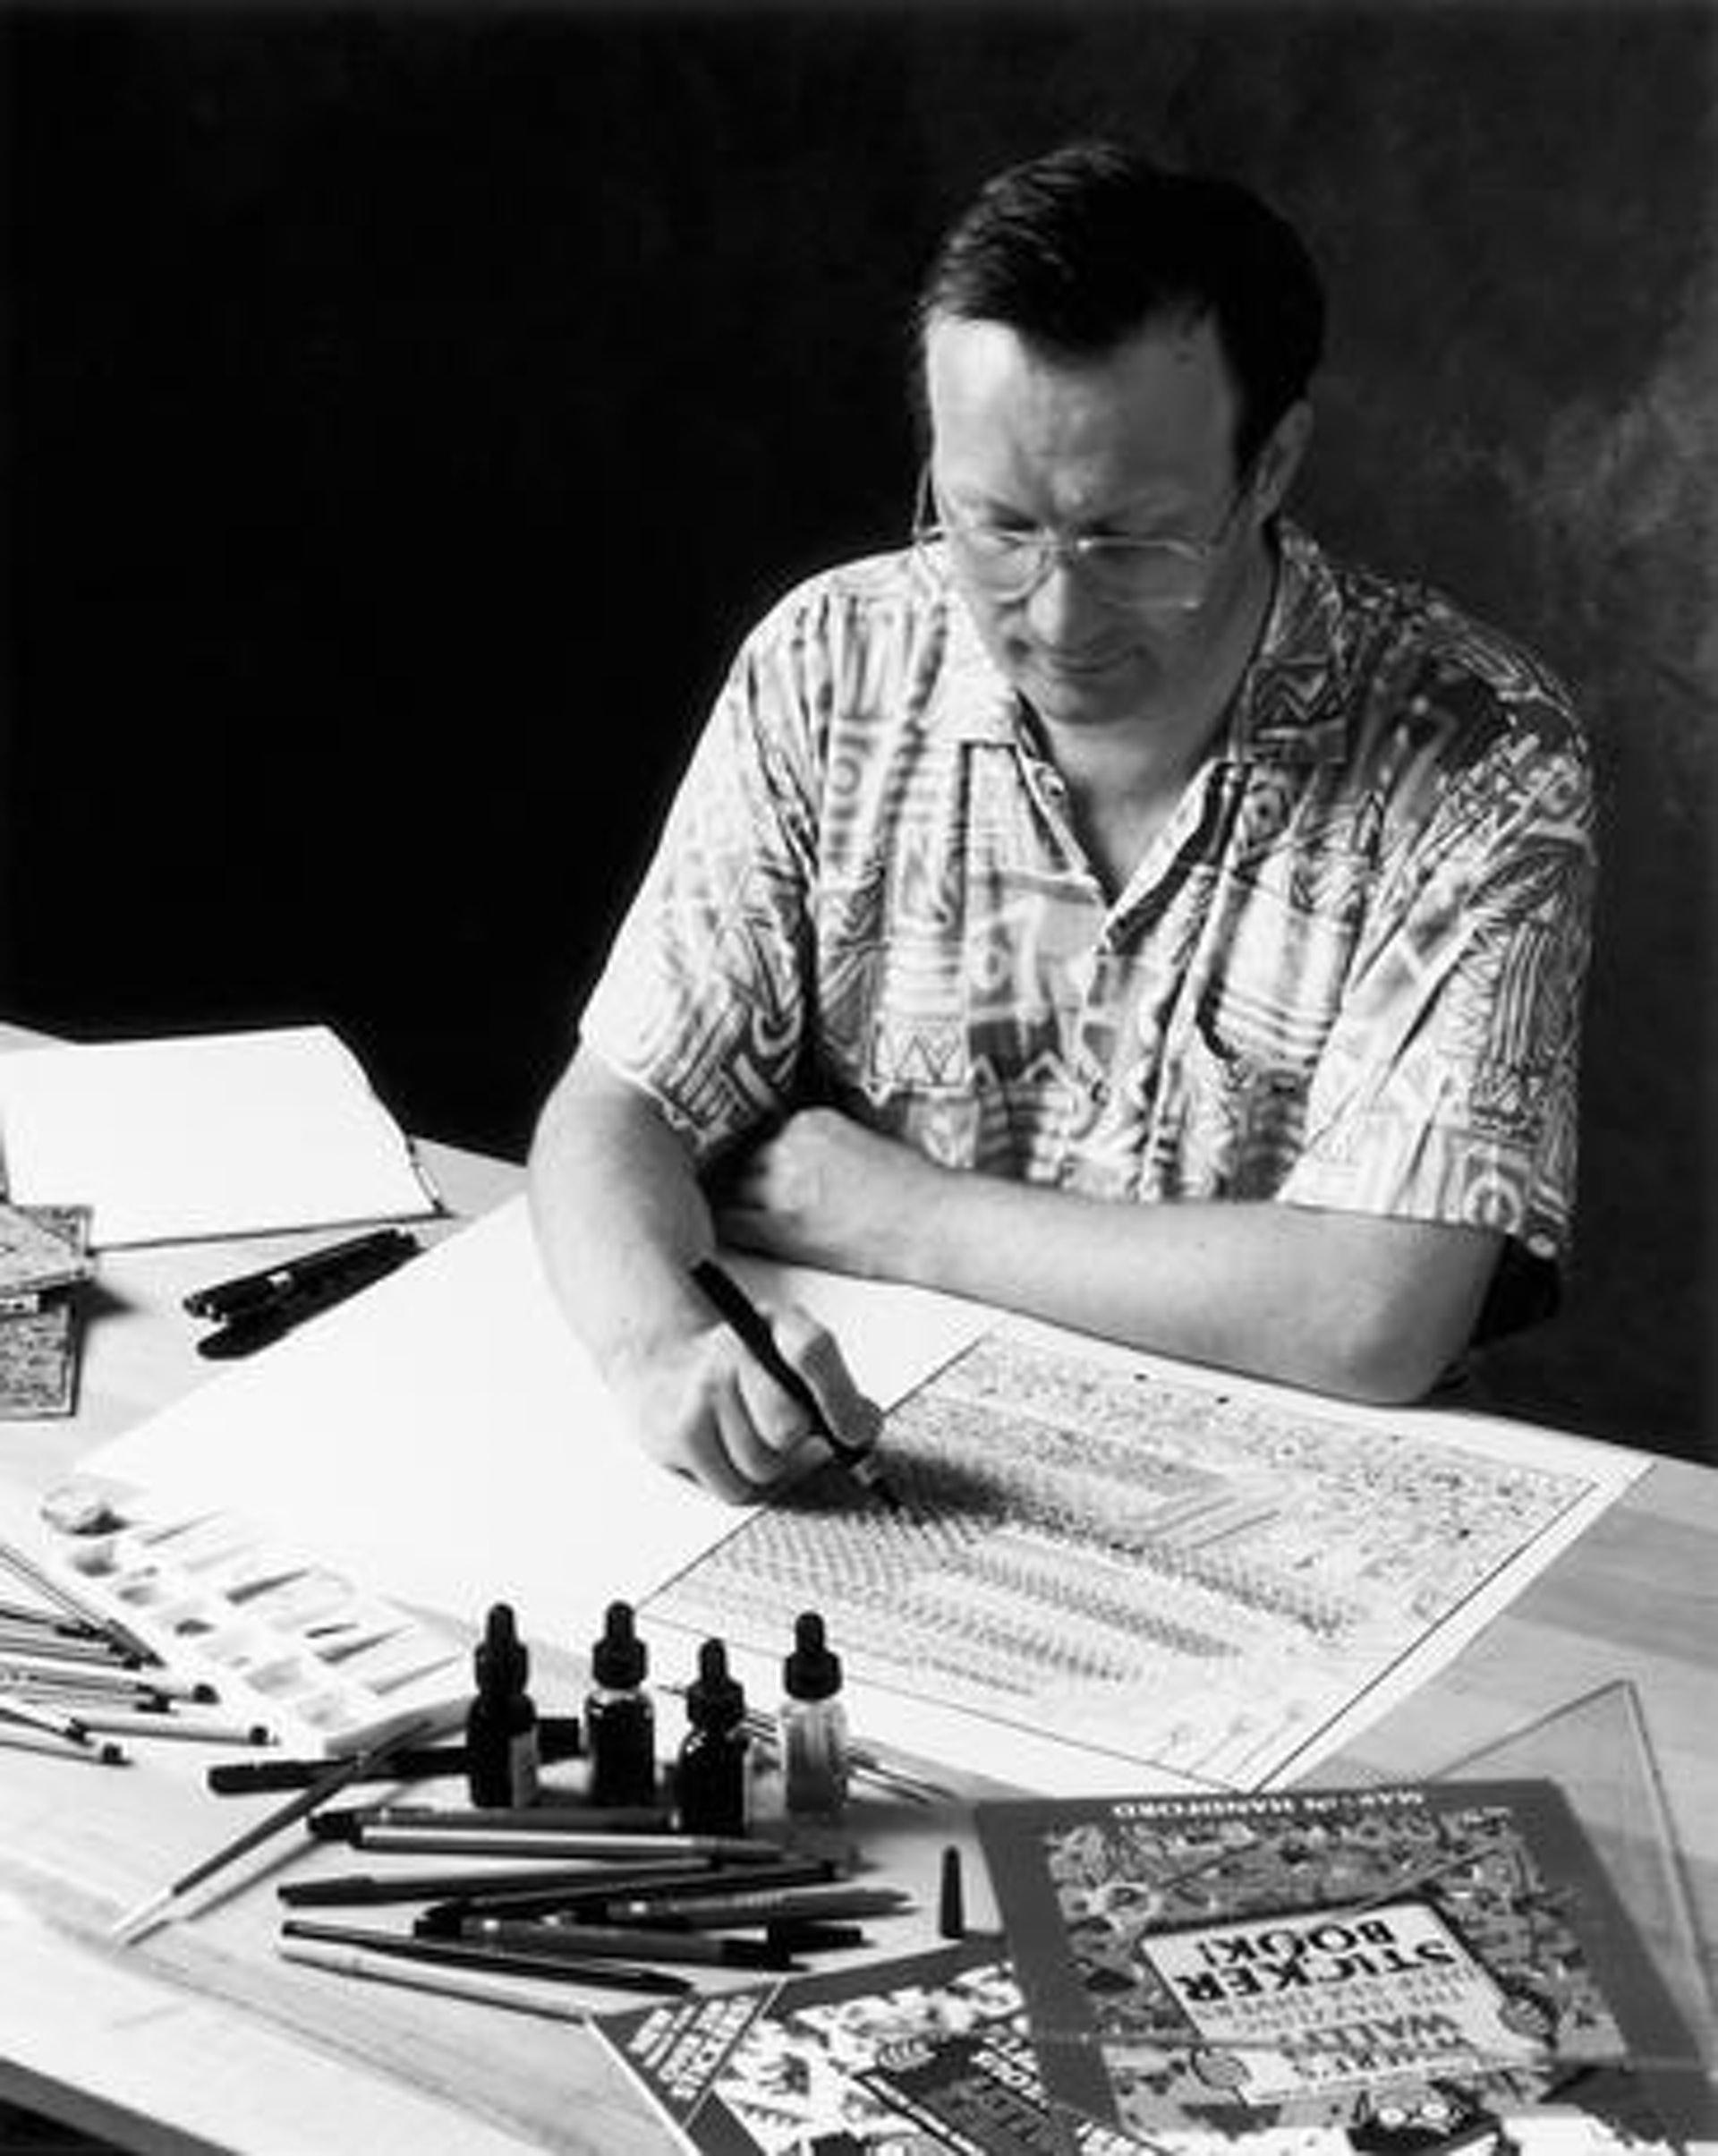 英国插画家Martin Handford,创作出绘本《Where's Wally? 》。 (网上图片)